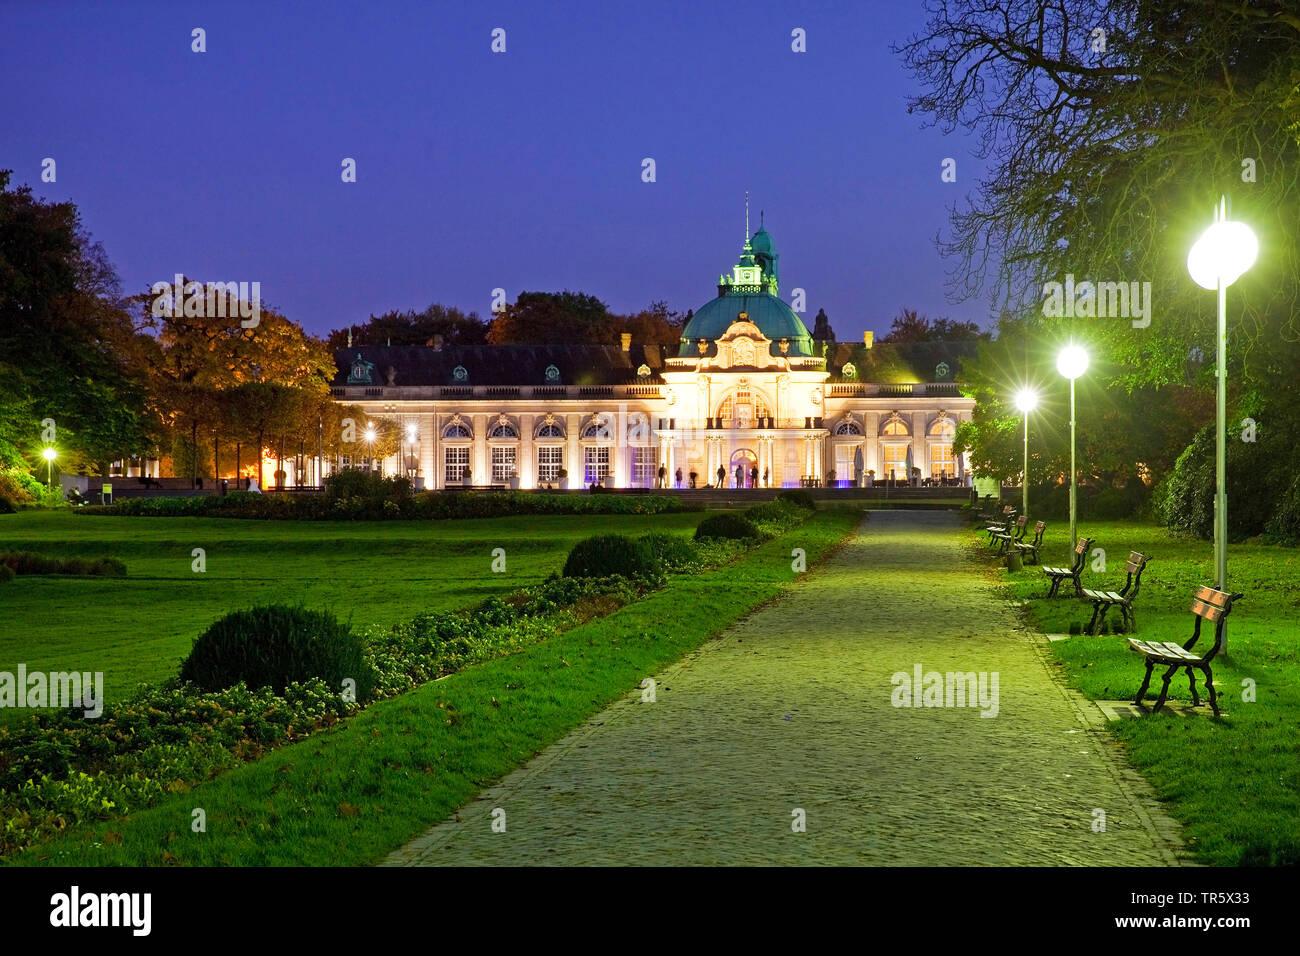 illuminated Kaiserpalais in the spa park at blue hour, Germany, North Rhine-Westphalia, East Westphalia, Bad Oeynhausen Stock Photo